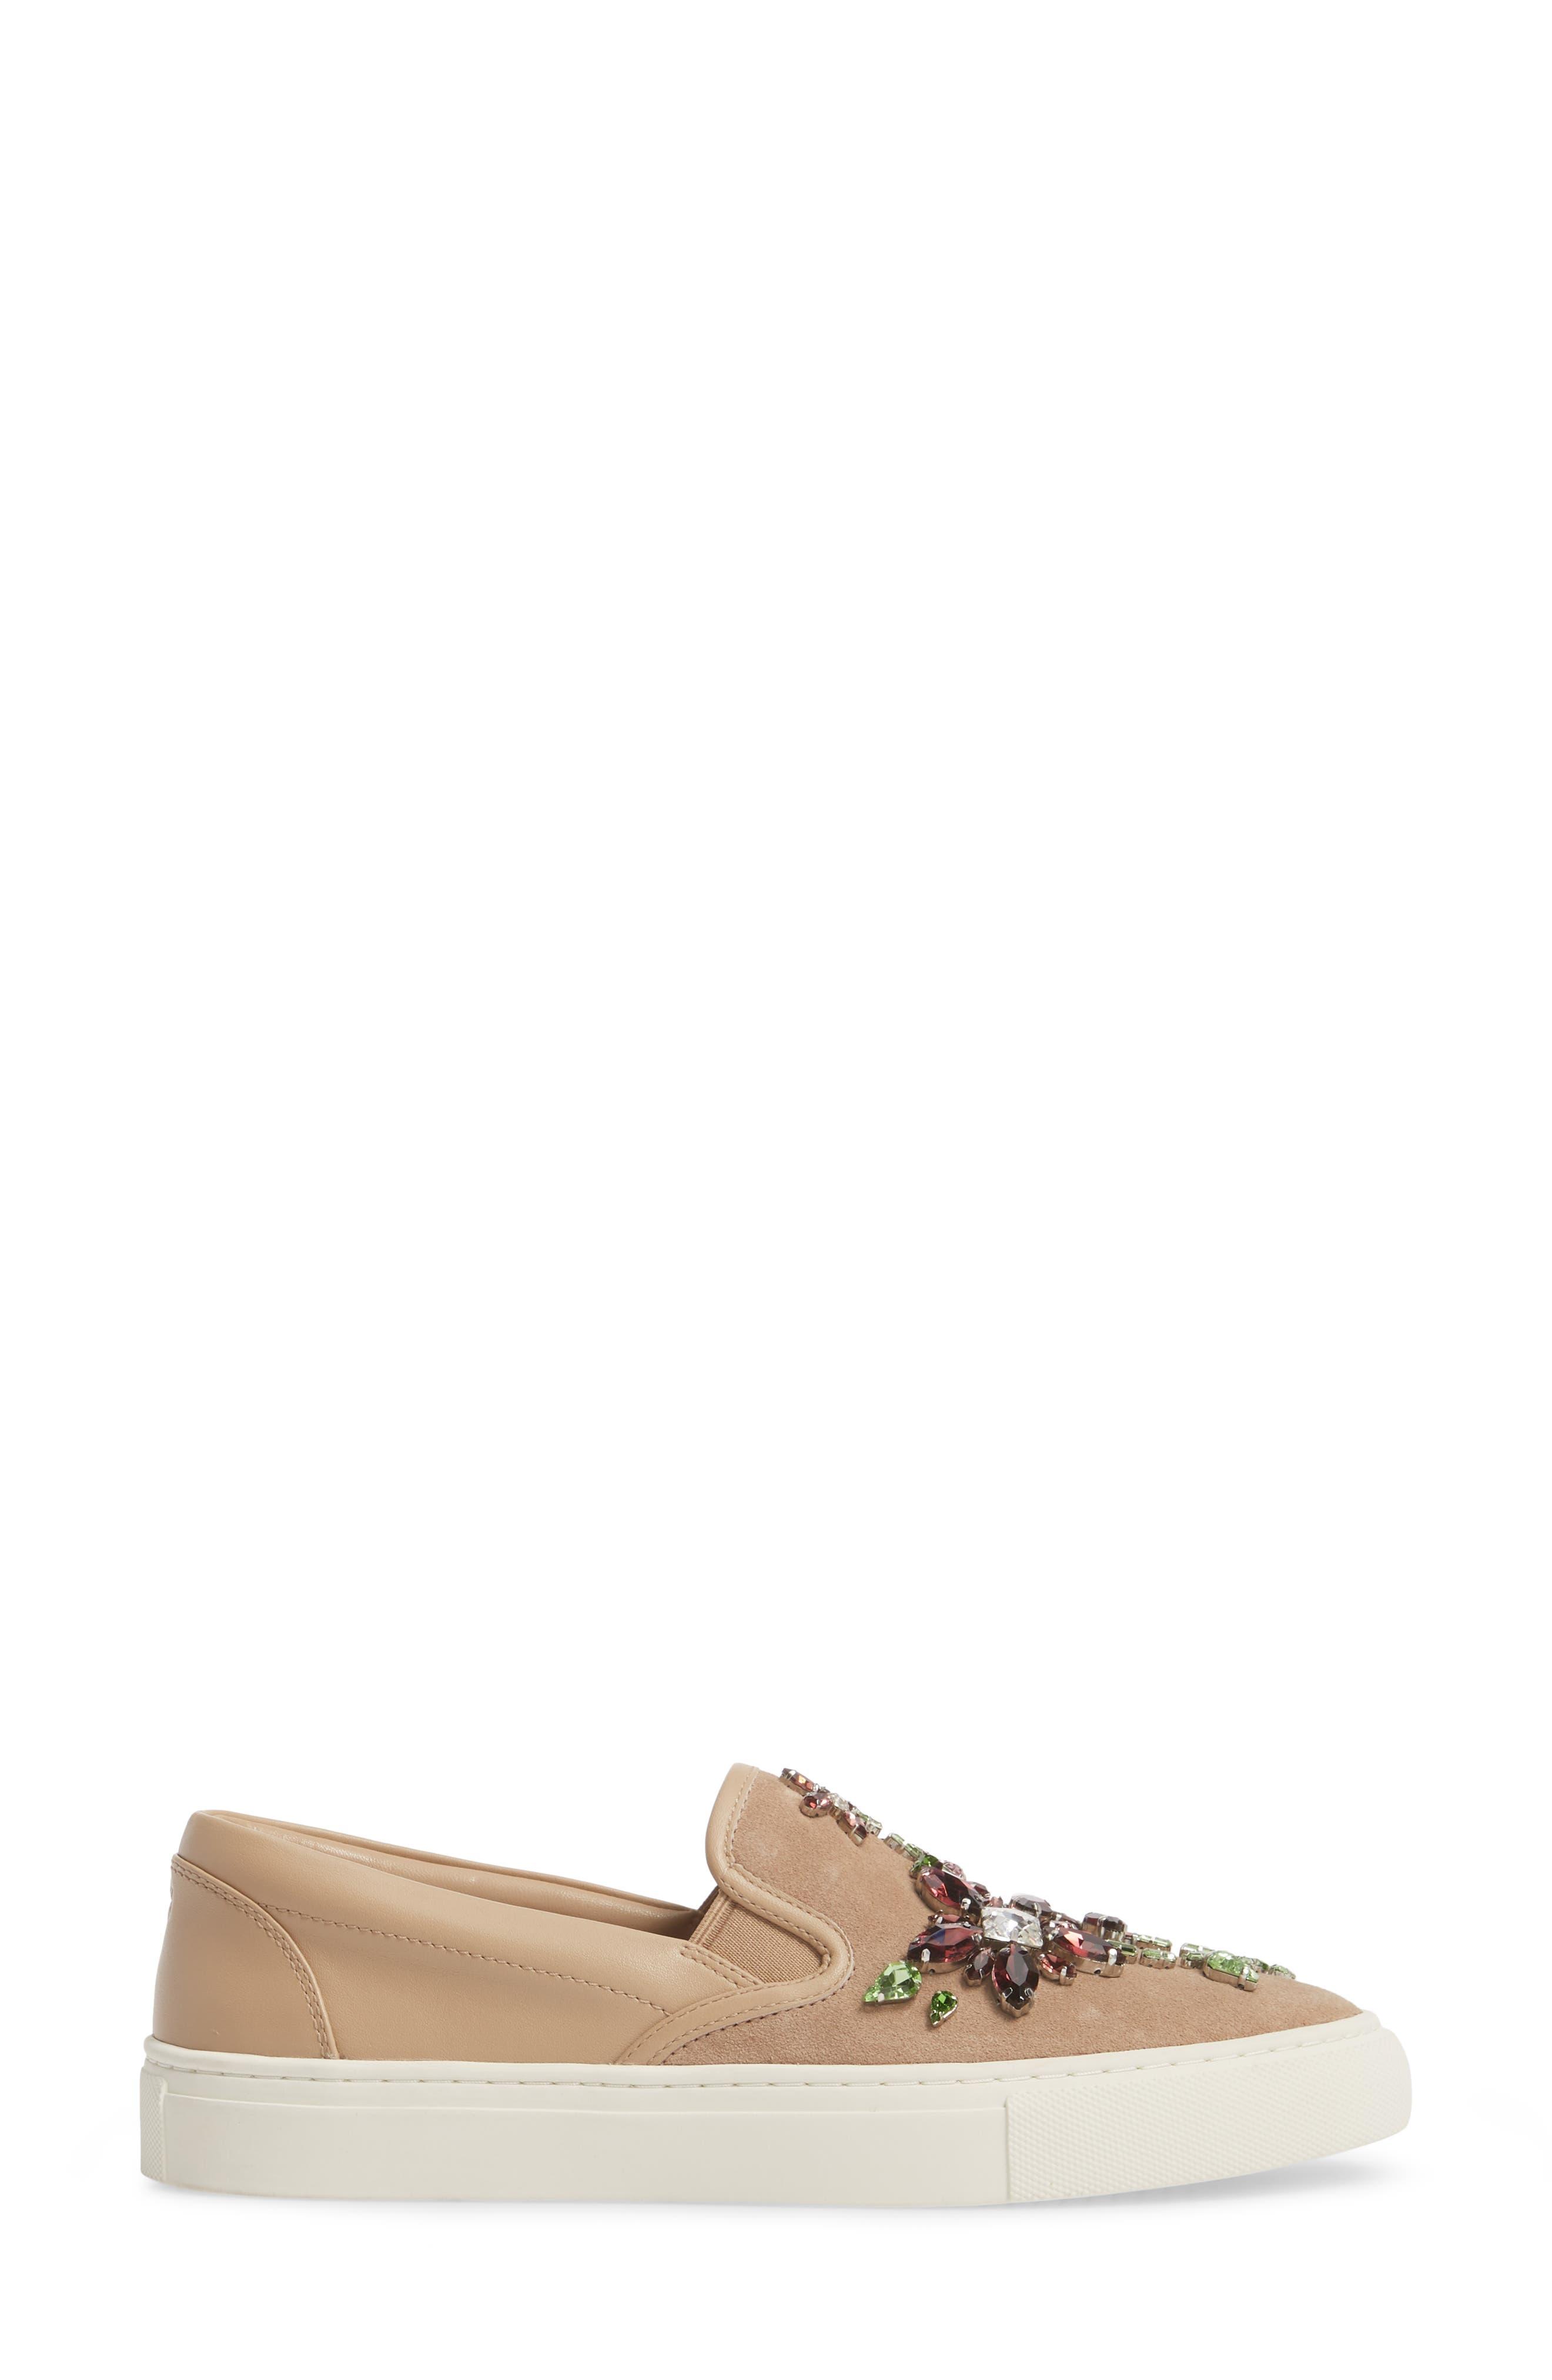 Meadow Embellished Slip-On Sneaker,                             Alternate thumbnail 3, color,                             254